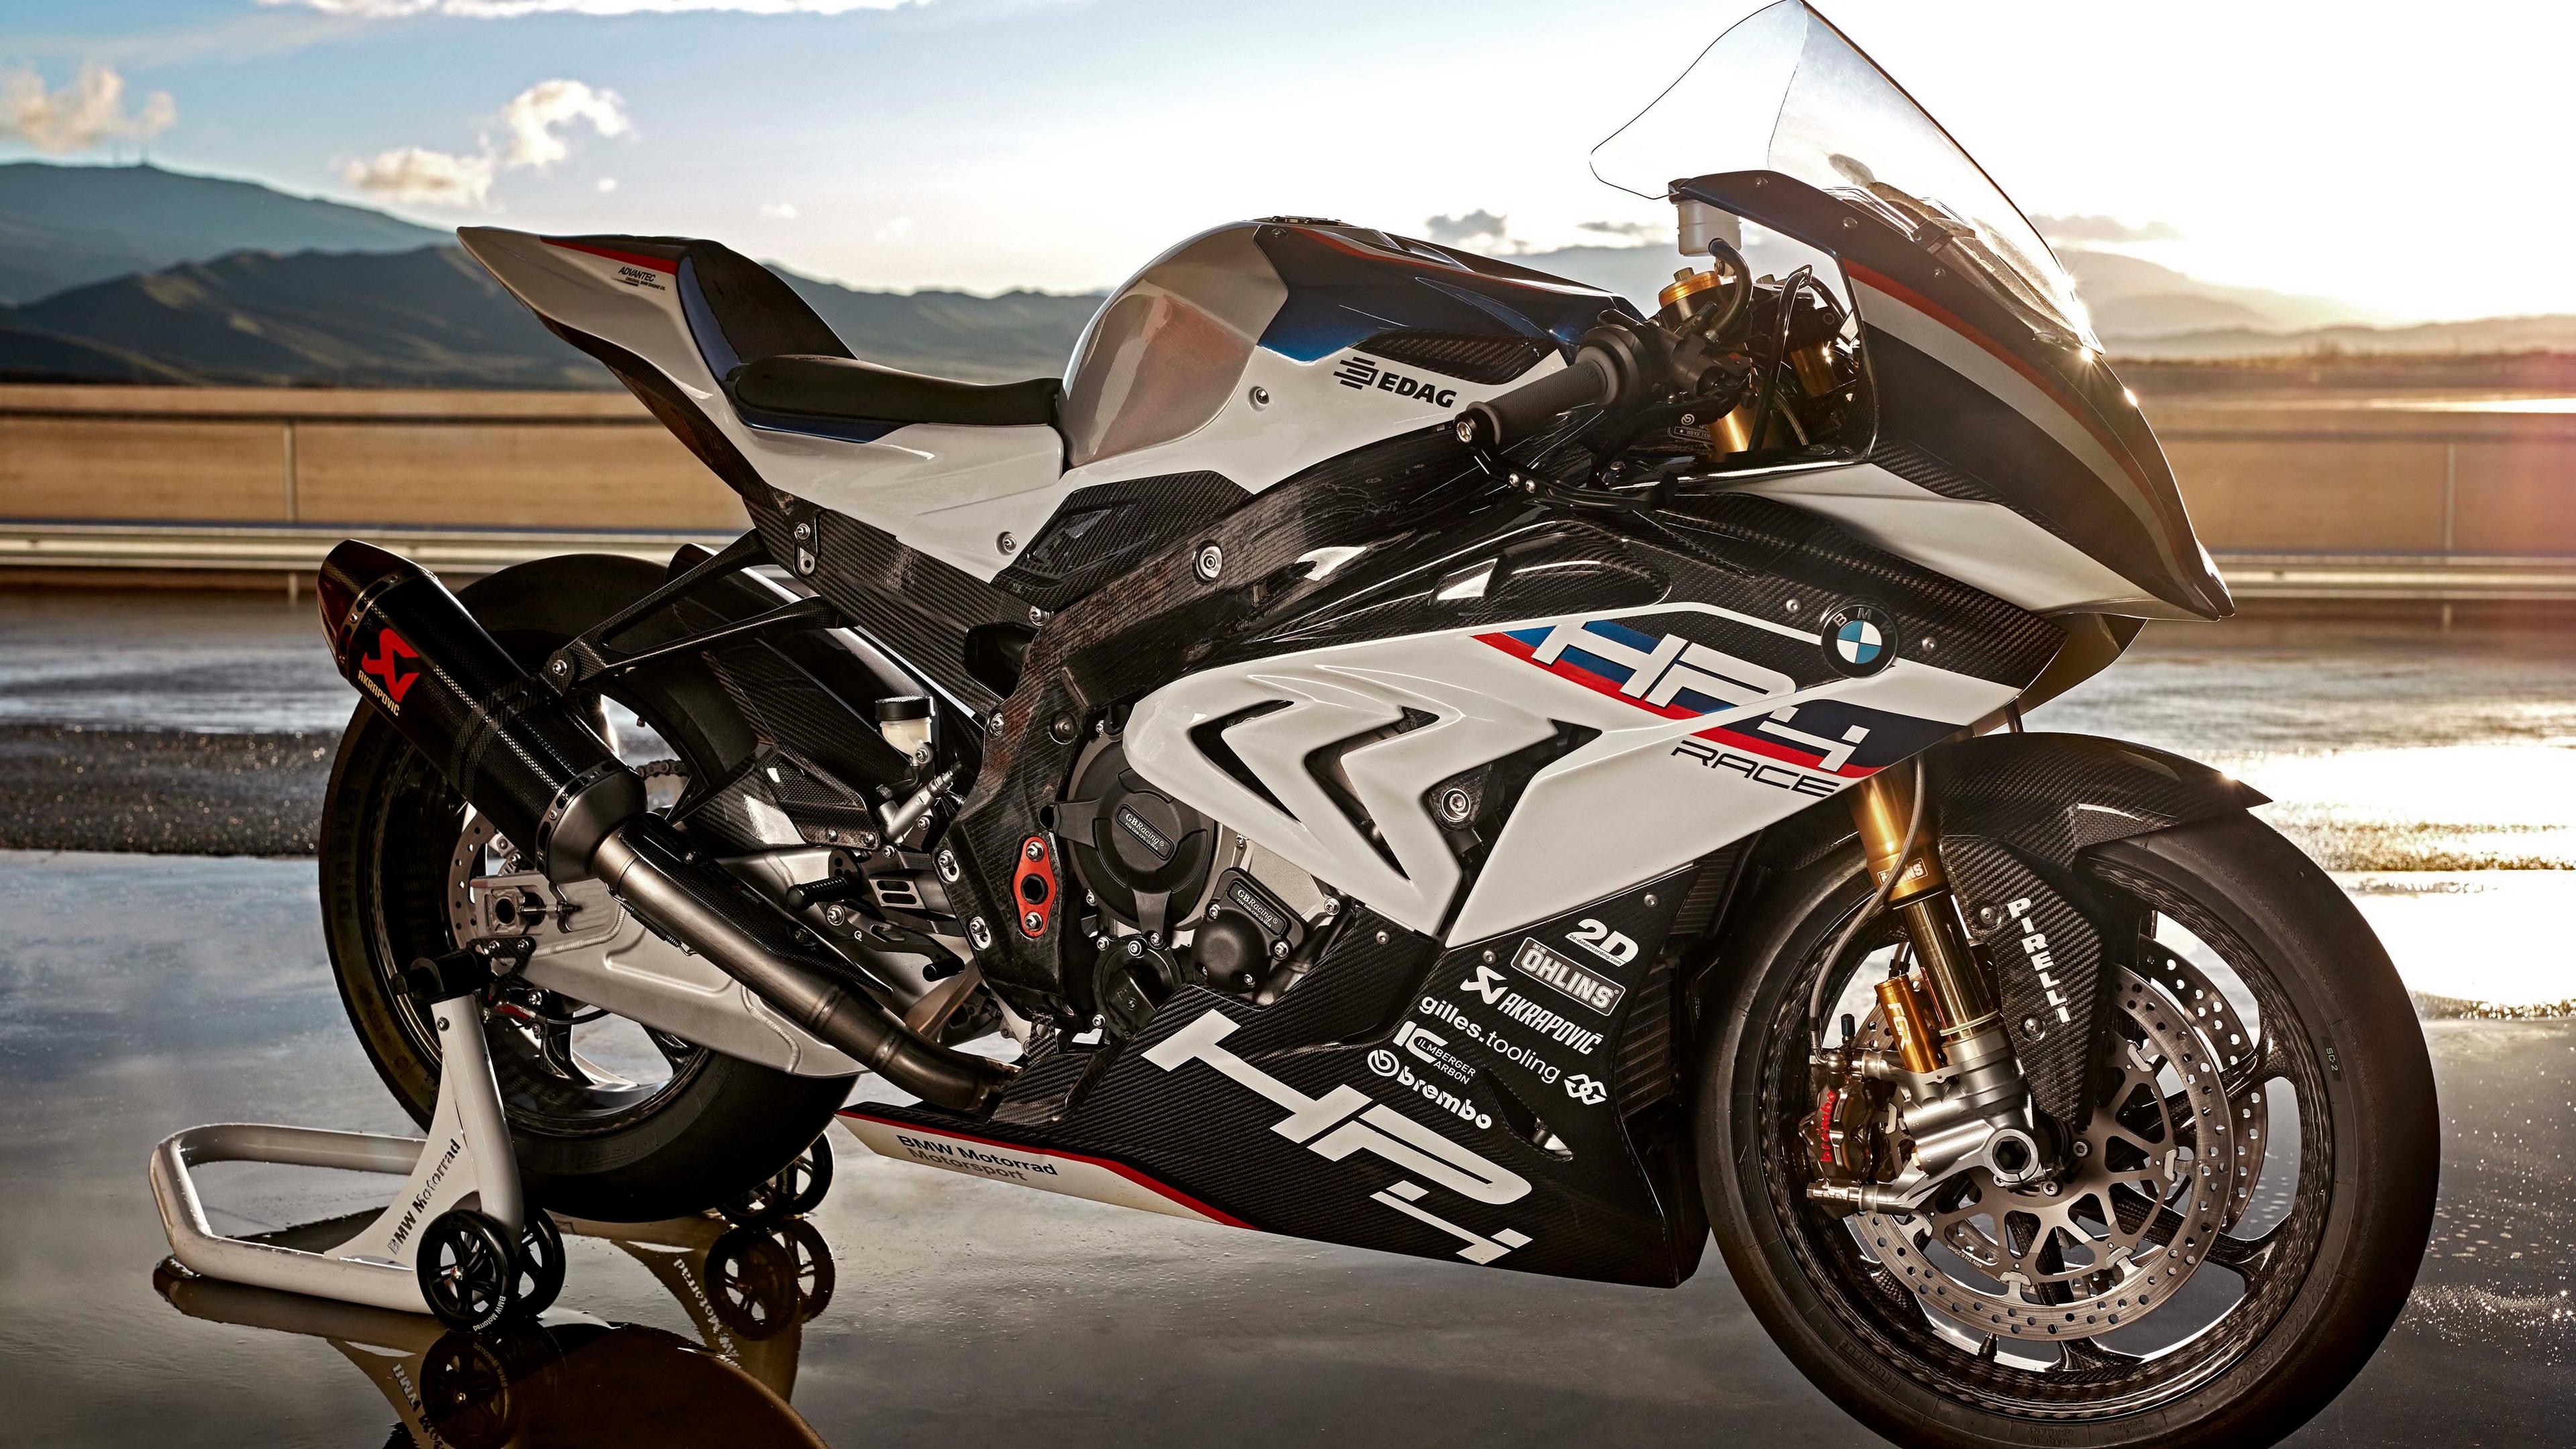 bmw h4 race superbike 4k 1536316310 - Bmw H4 Race Superbike 4k - hd-wallpapers, bmw wallpapers, bmw h4 wallpapers, bikes wallpapers, 4k-wallpapers, 2017 bikes wallpapers